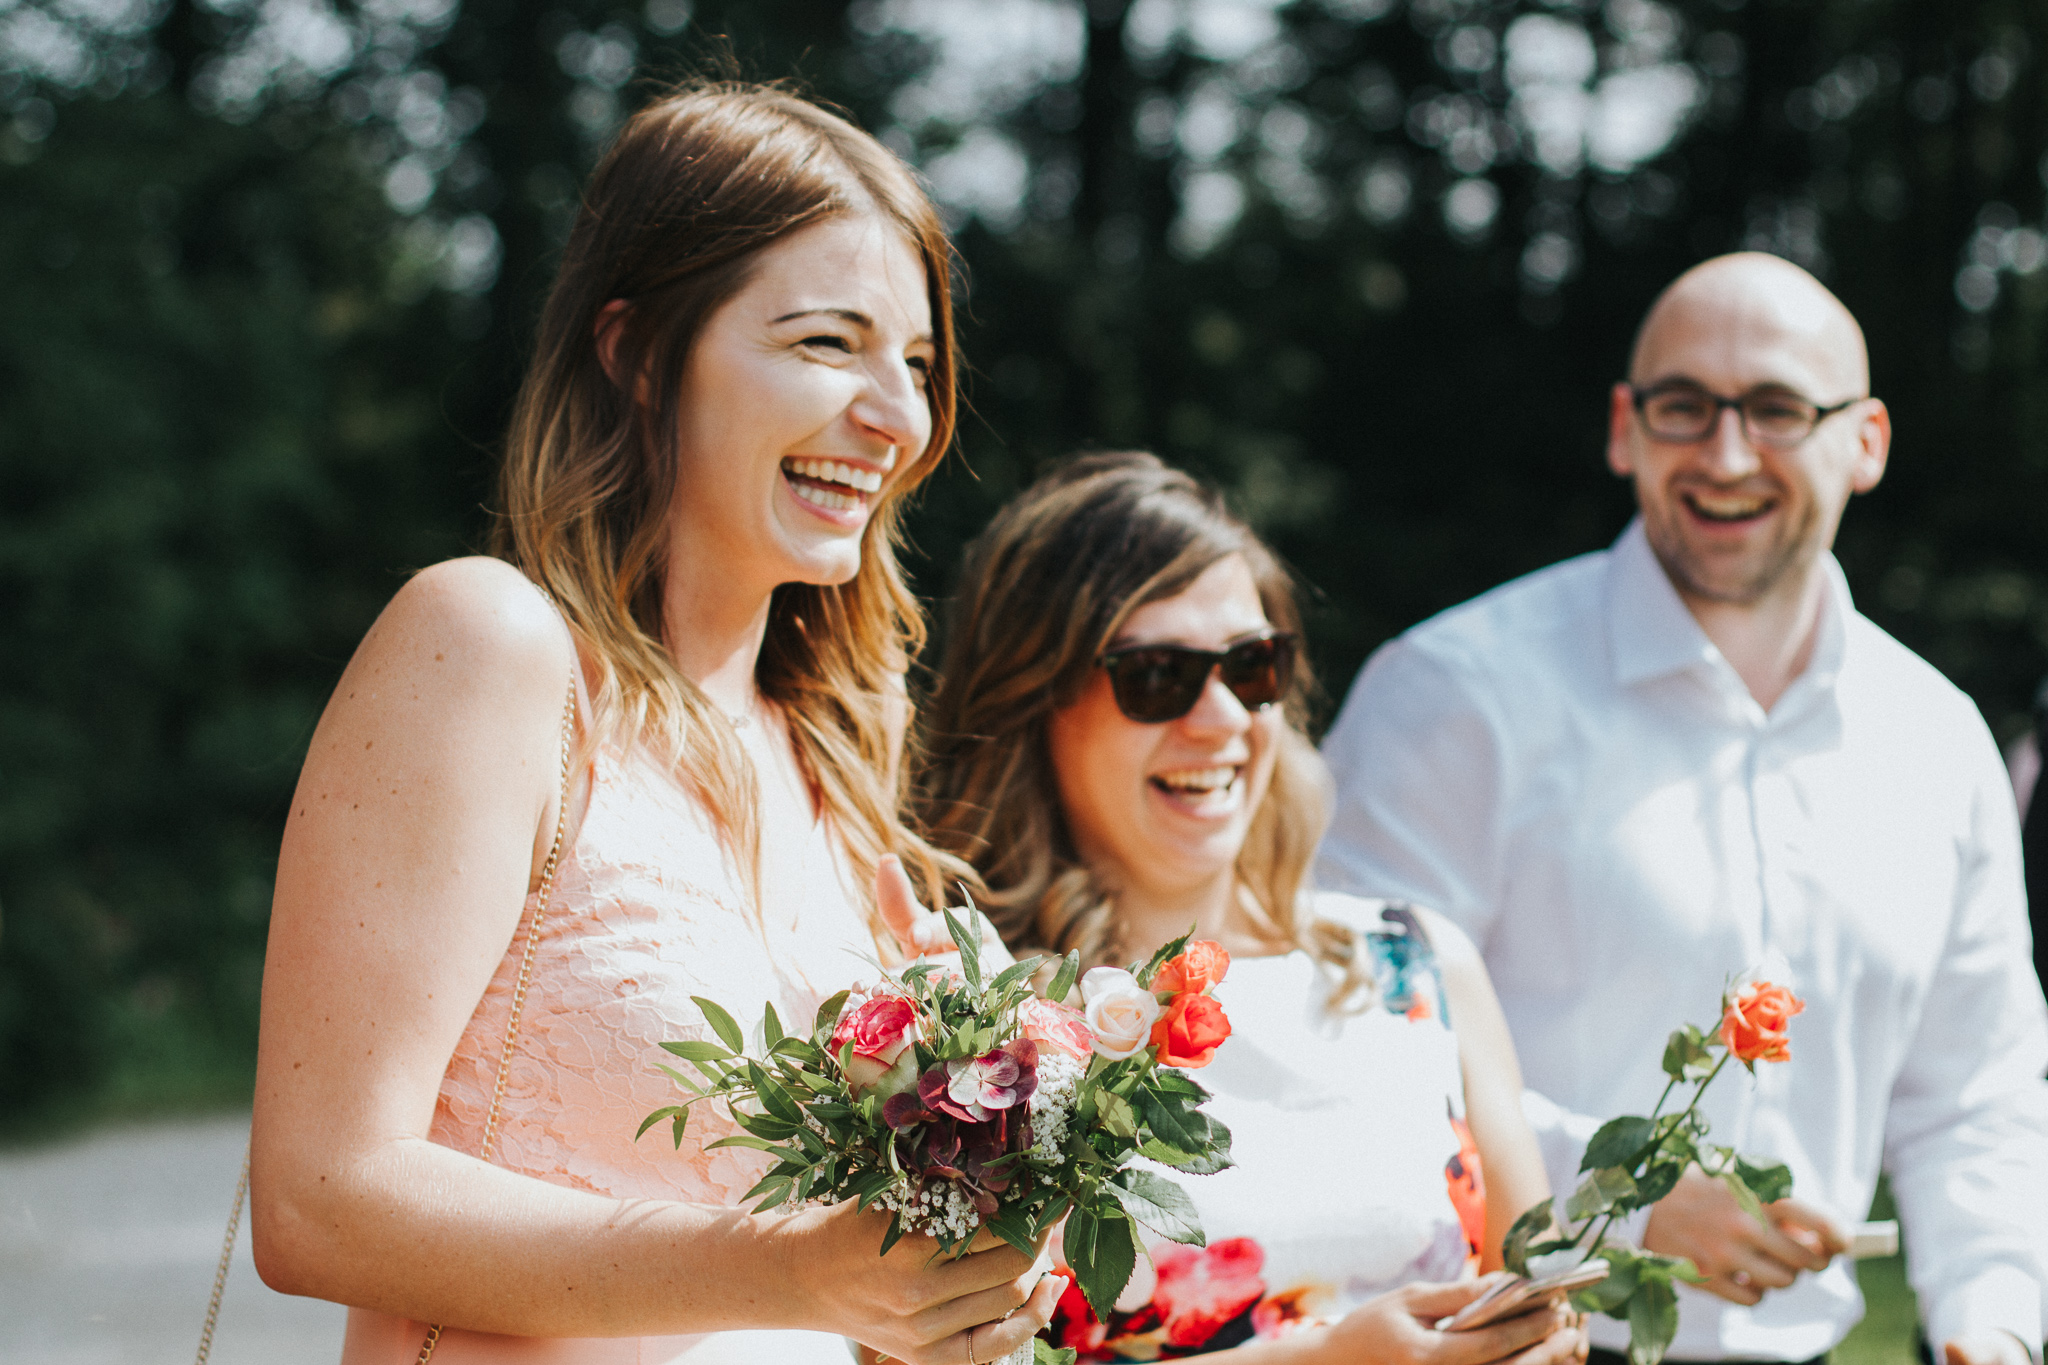 Hochzeitsfotograf-Seck-22.jpg